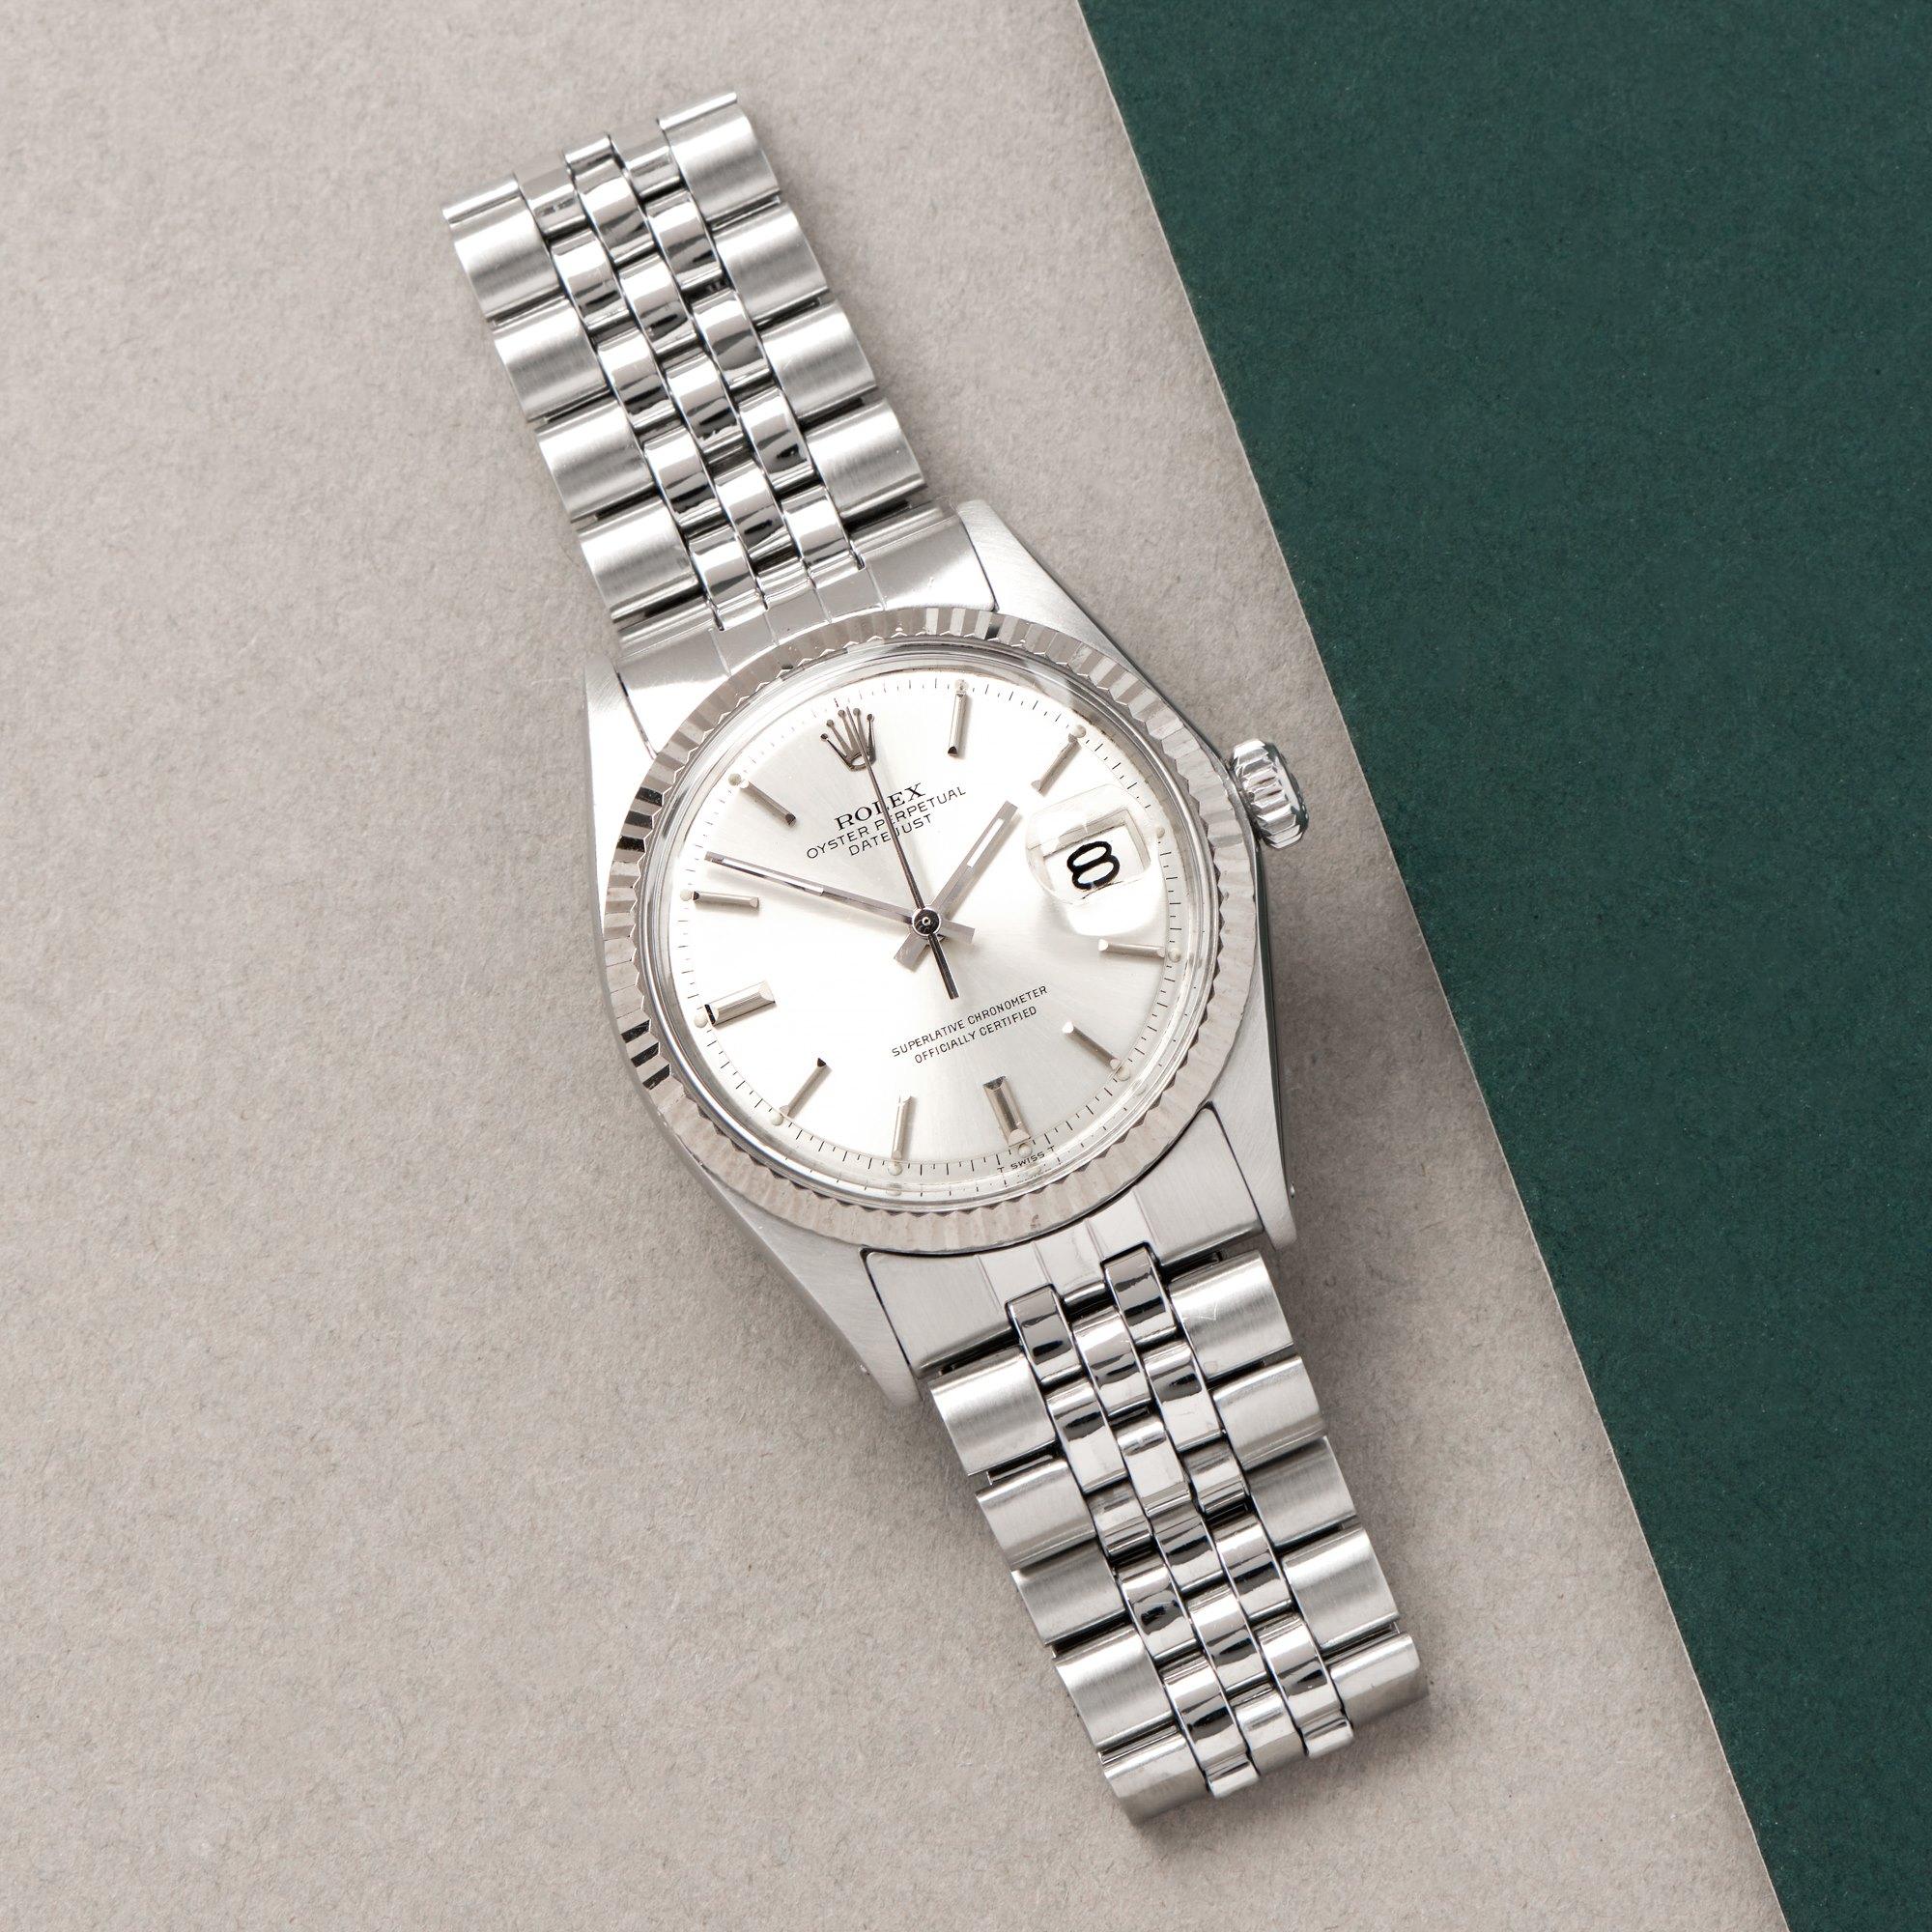 Rolex Datejust 36 18K White Gold & Stainless Steel 1603